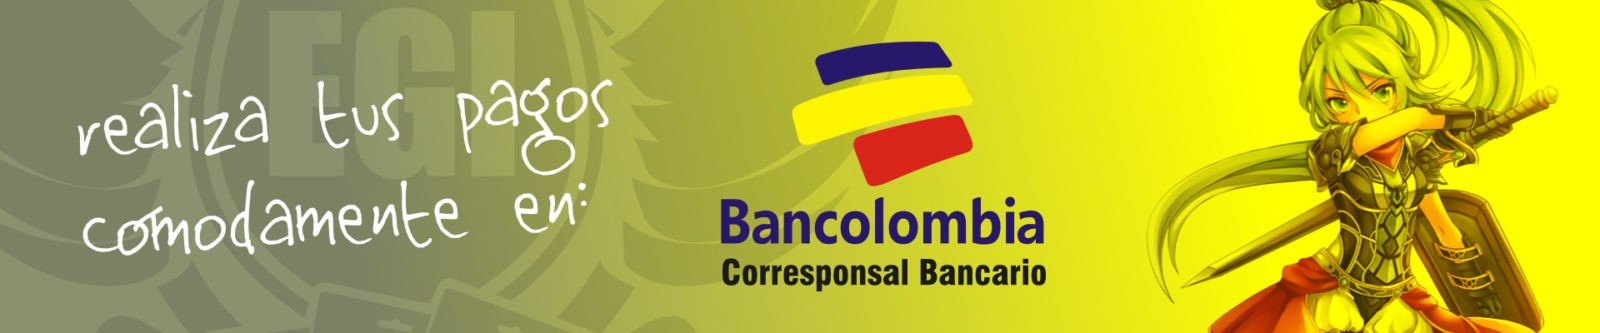 banner-corresponsal-bancario-bancolombia